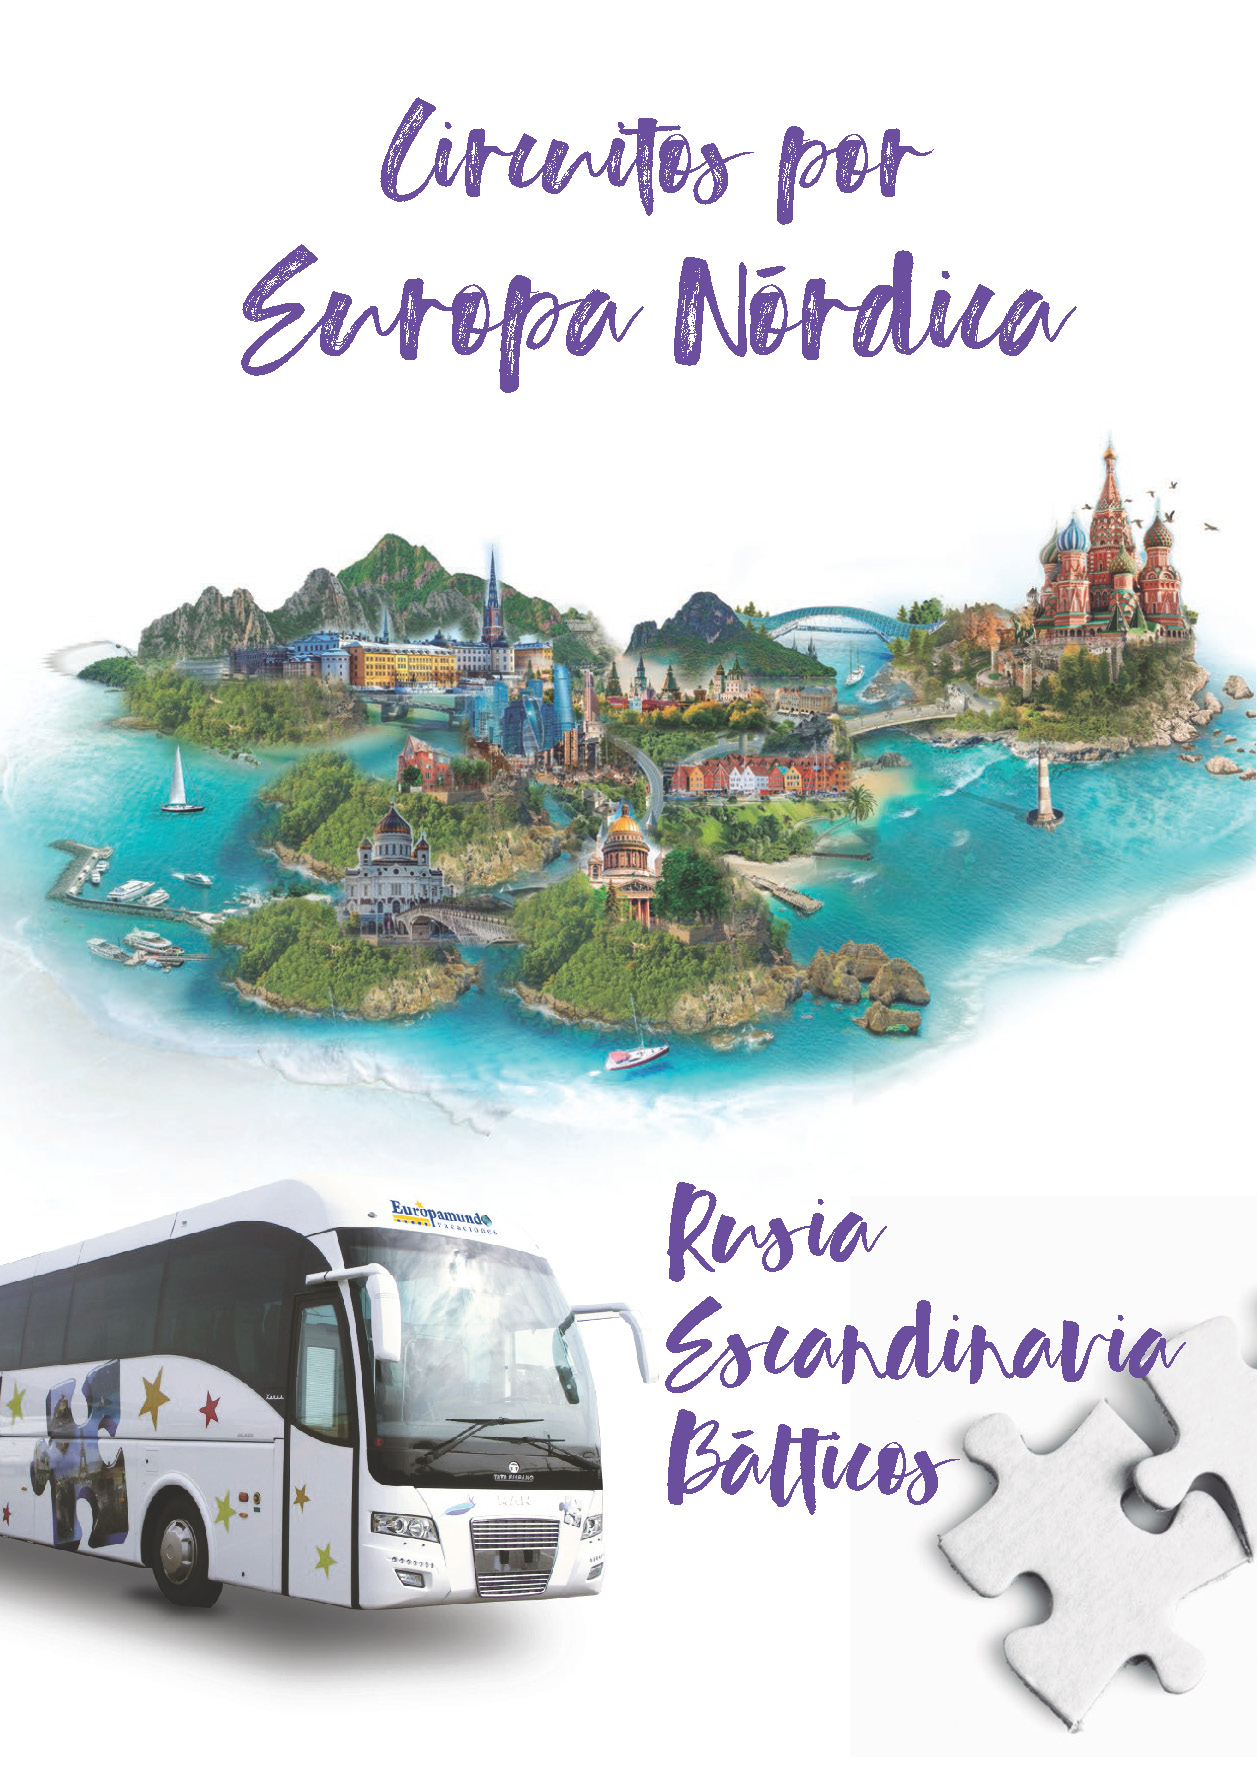 Catalogo Europamundo Vacaciones Europa Nordica 2018-2019